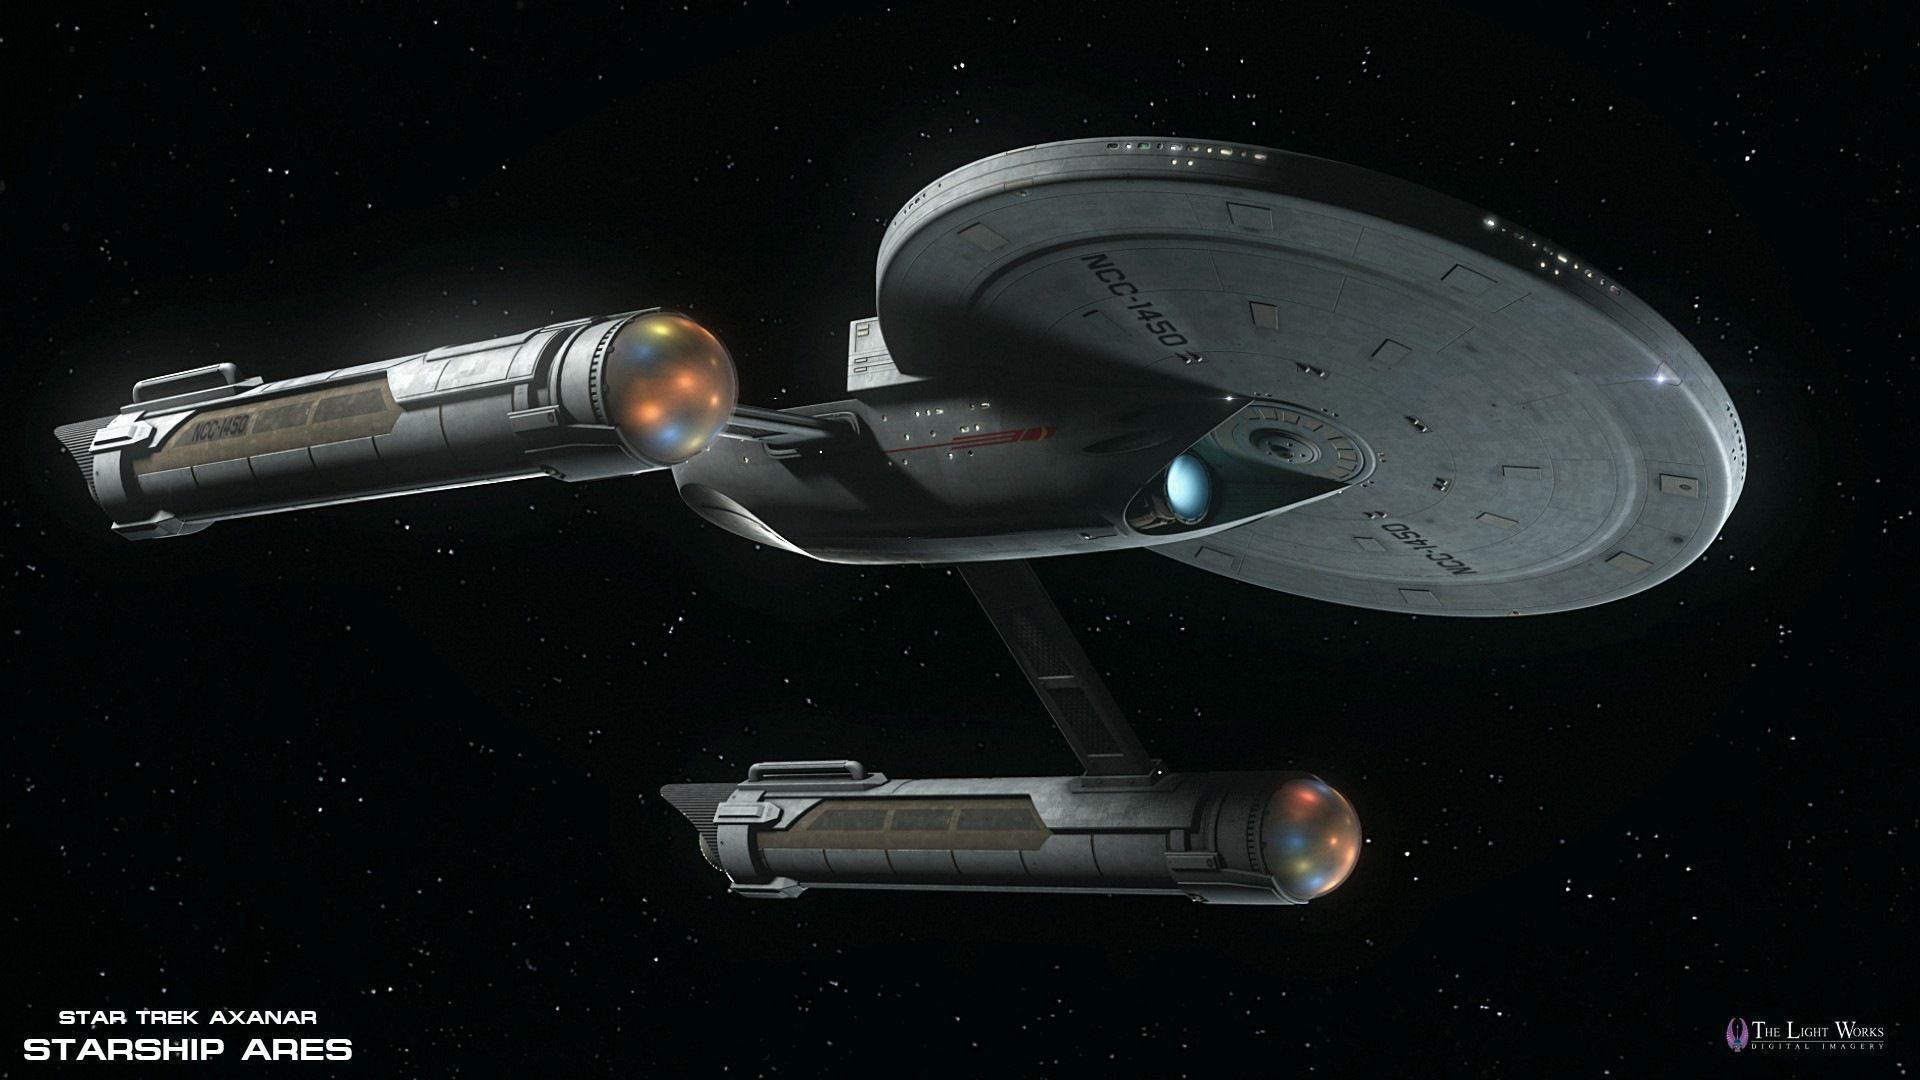 Star trek ships uss ares design from star trek axanar for Wohnung star trek design